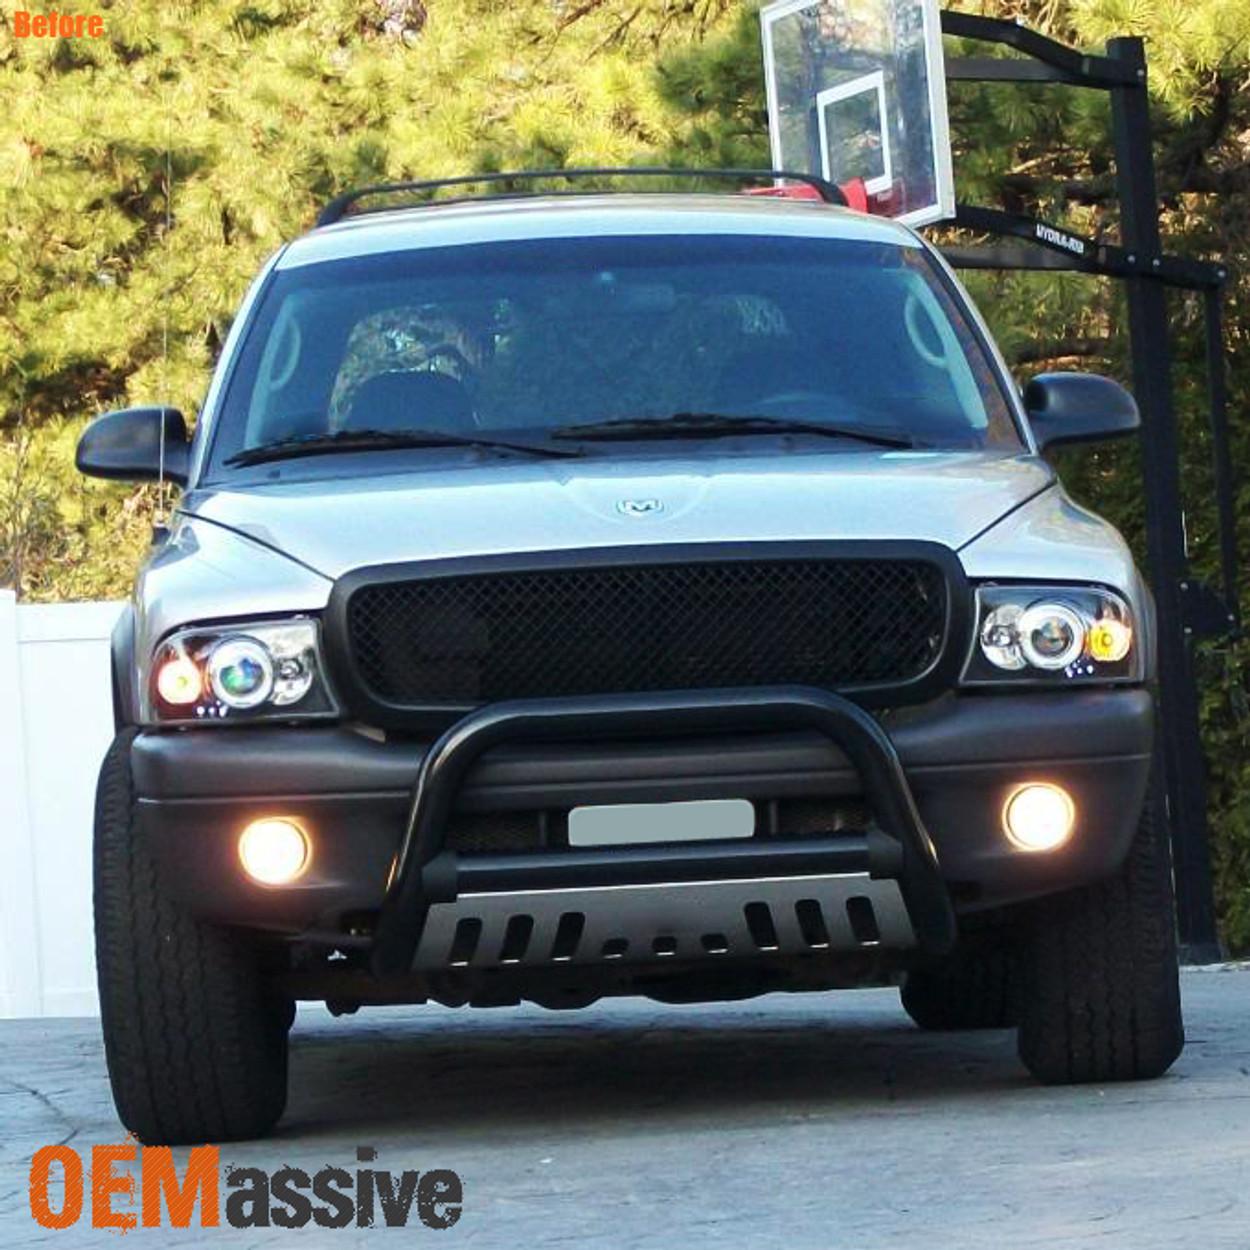 Fits 97 04 Dodge Dakota Durango Black Dual Halo Projector Led Headlights Lamp Oemassive